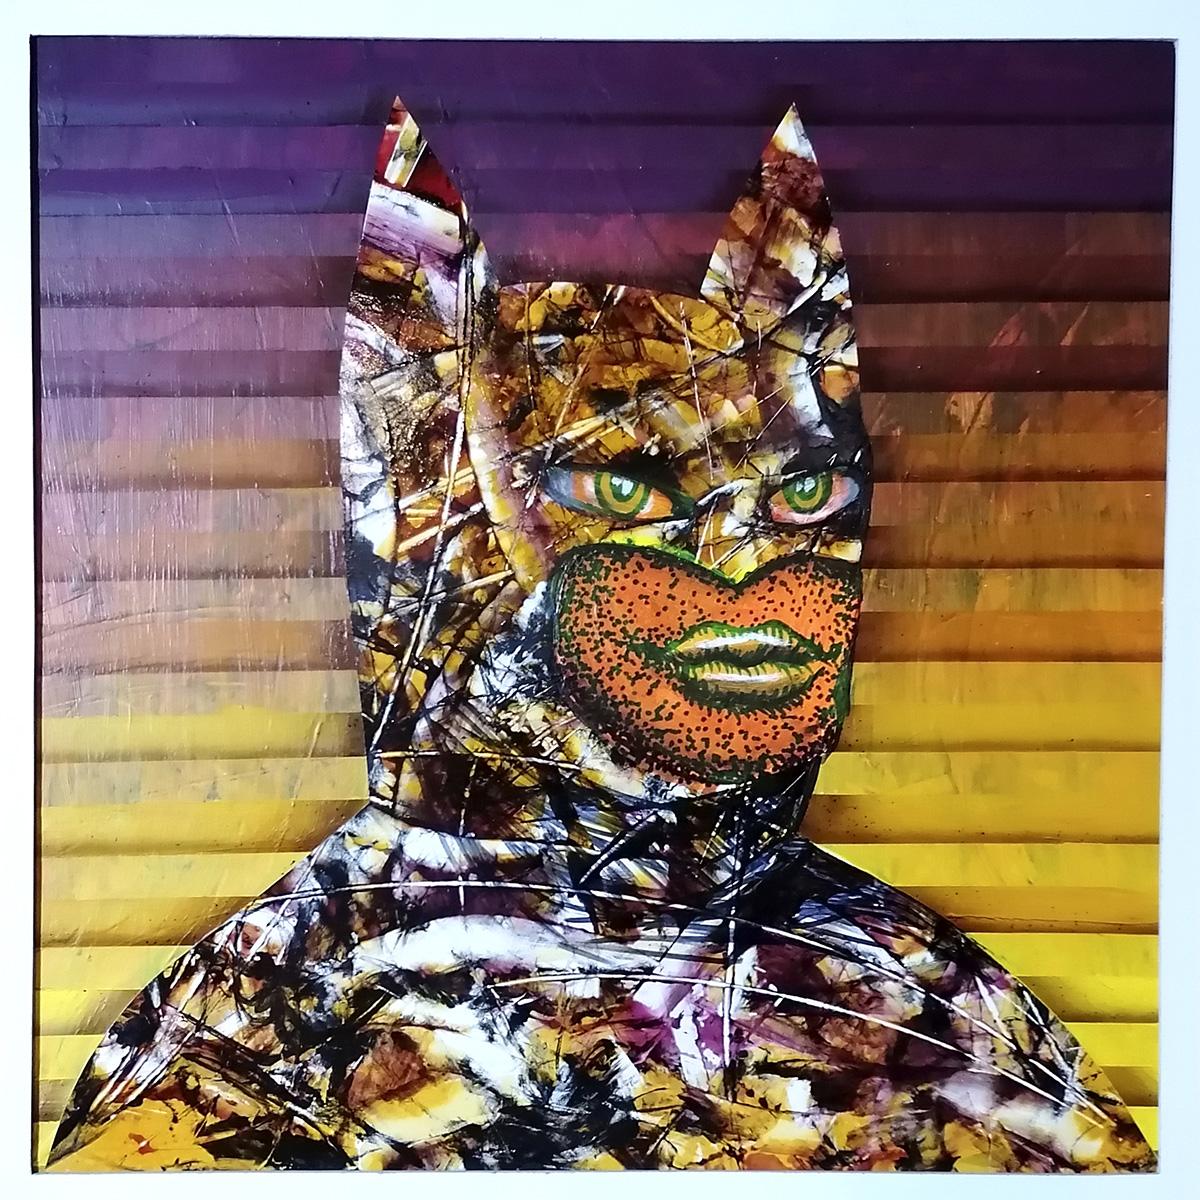 IRLO - Fatman, acrylic painting on canvas